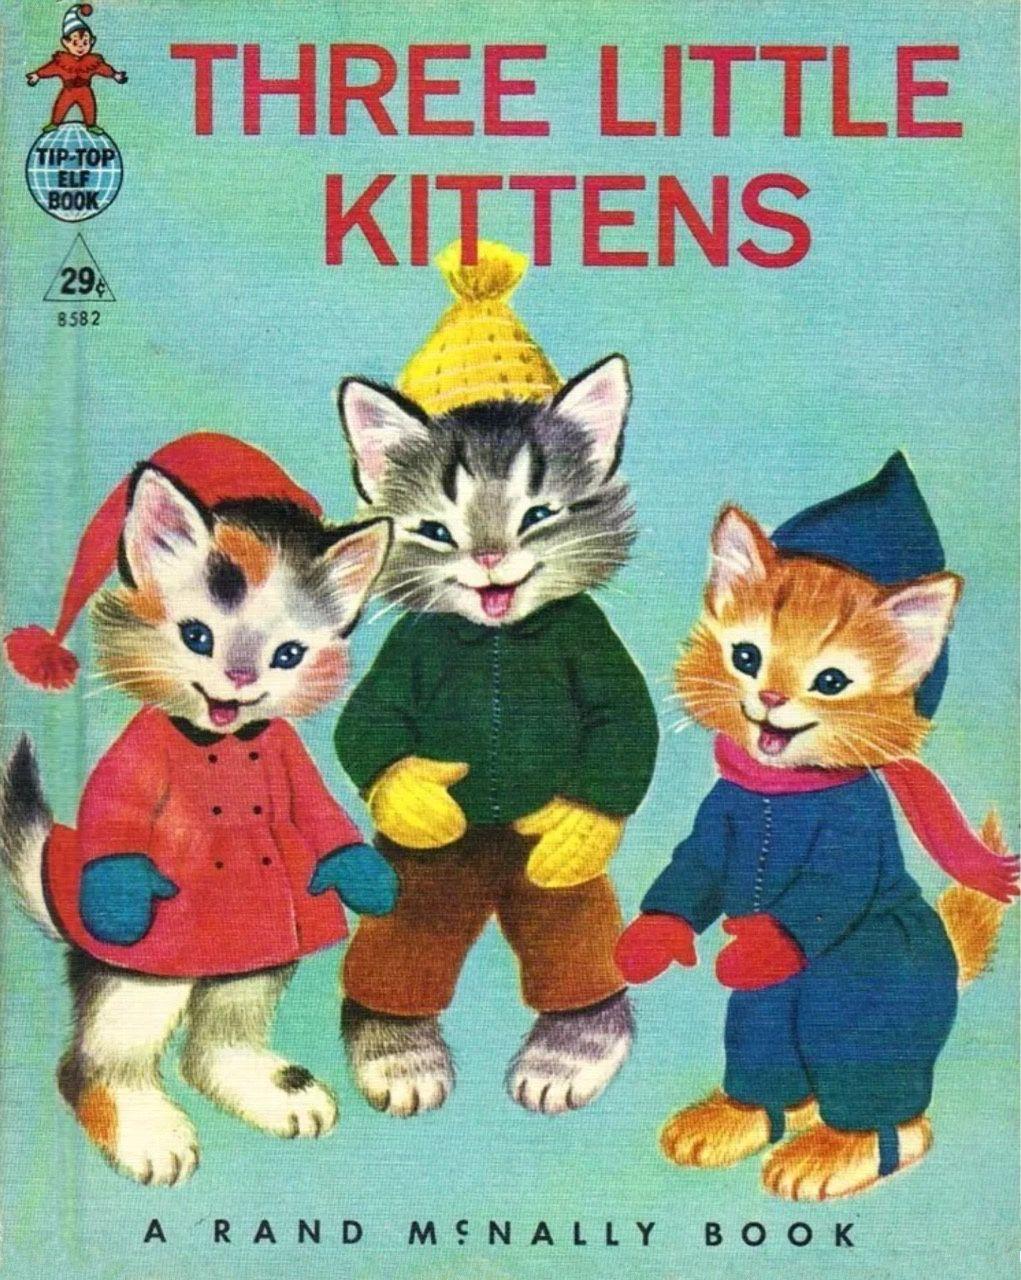 Not Found Little Kittens Vintage Children S Books Children S Book Illustration